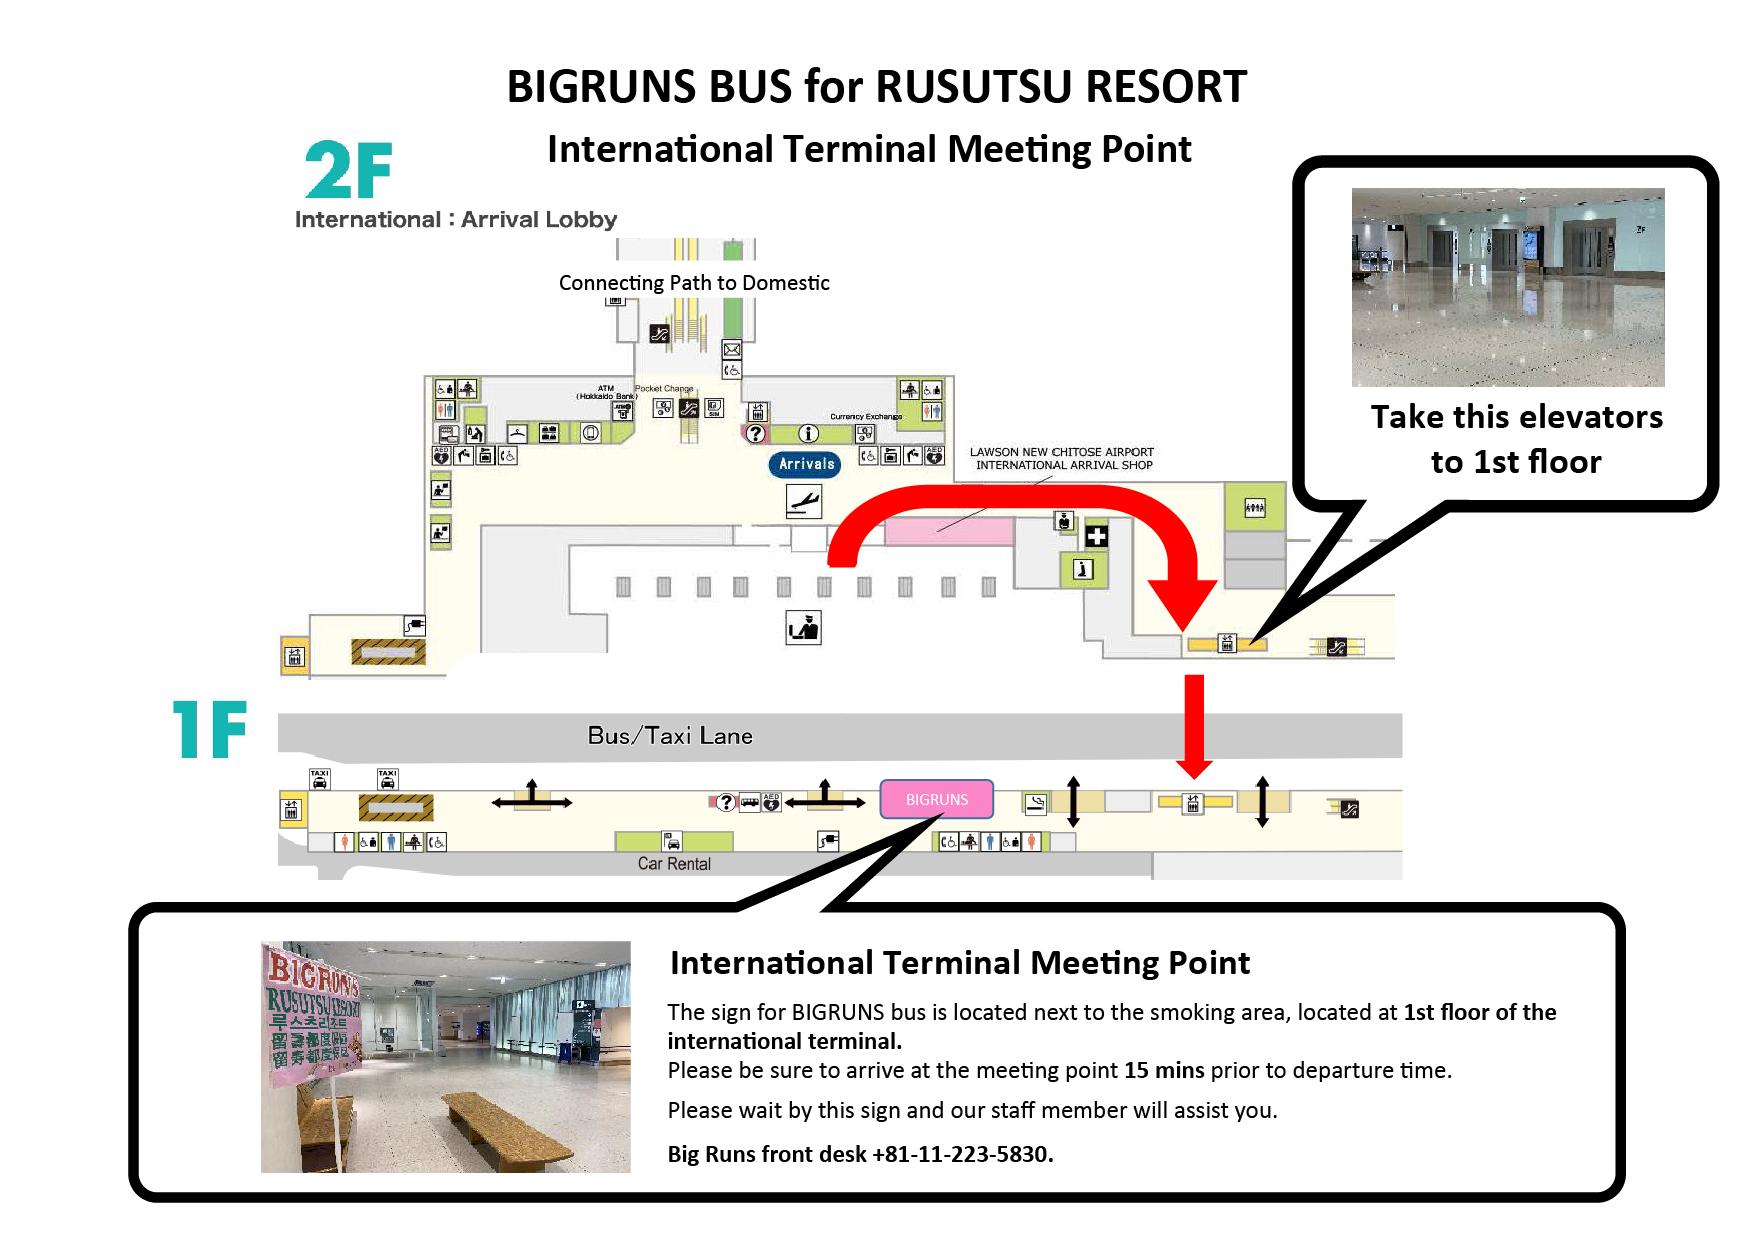 International Terminal BIGRUNS Bus Meeting Point